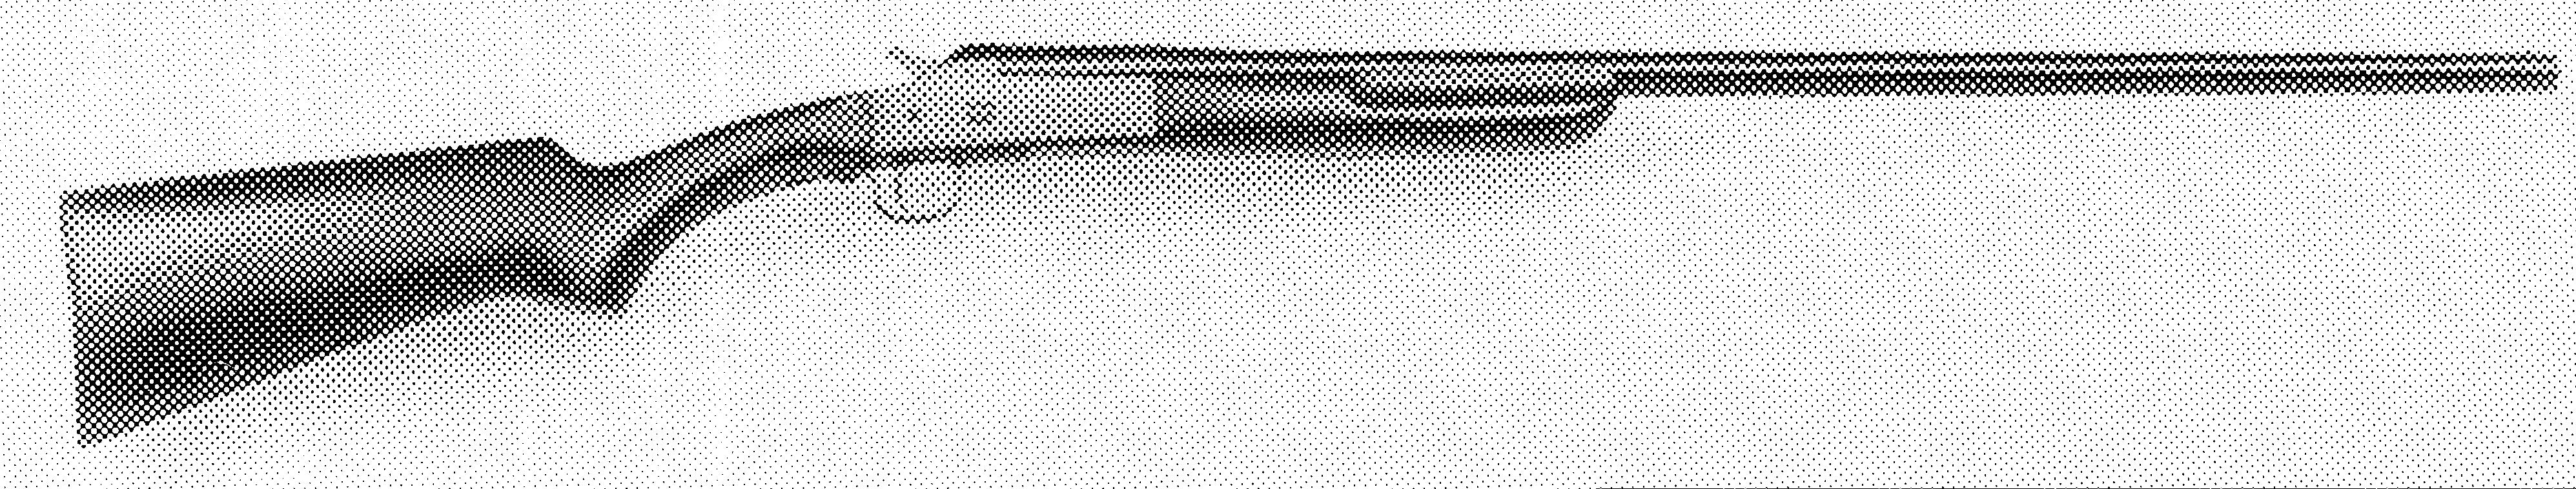 Single-Barrel Shotgun